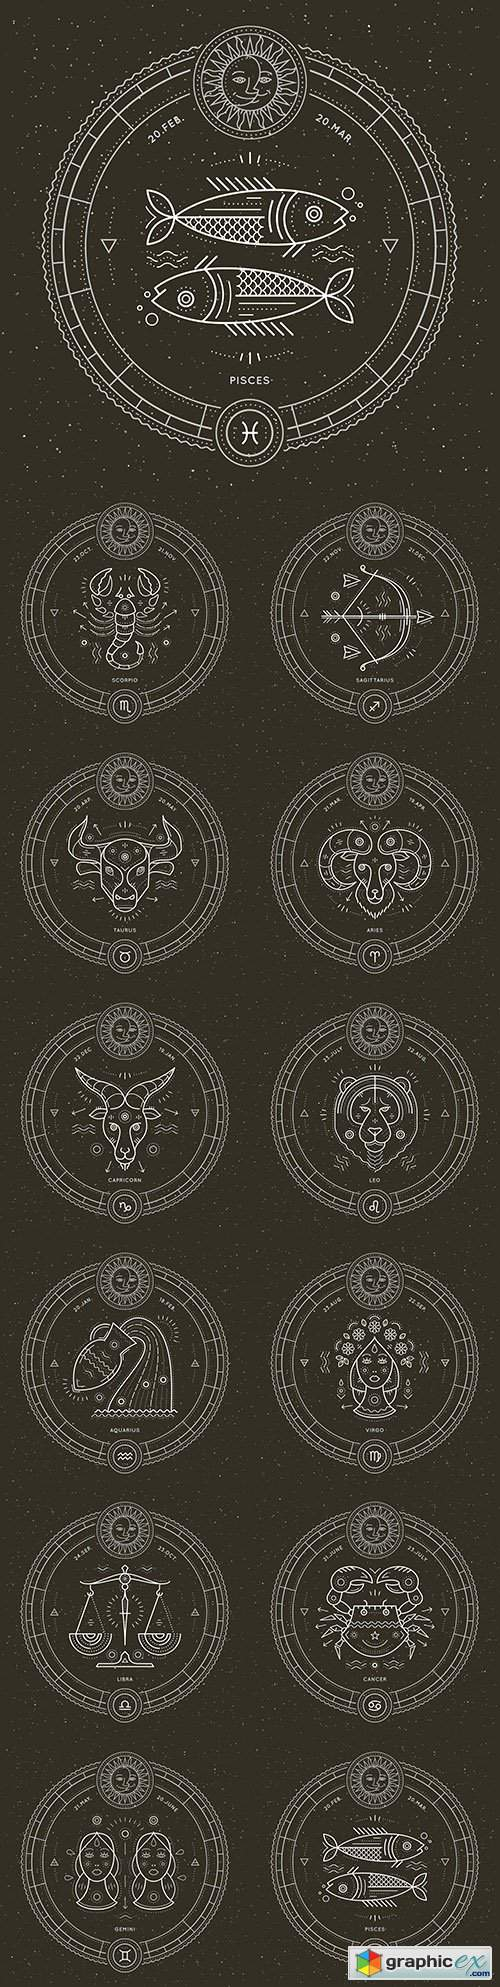 Zodiac sign retro astrological symbol and emblem illustration